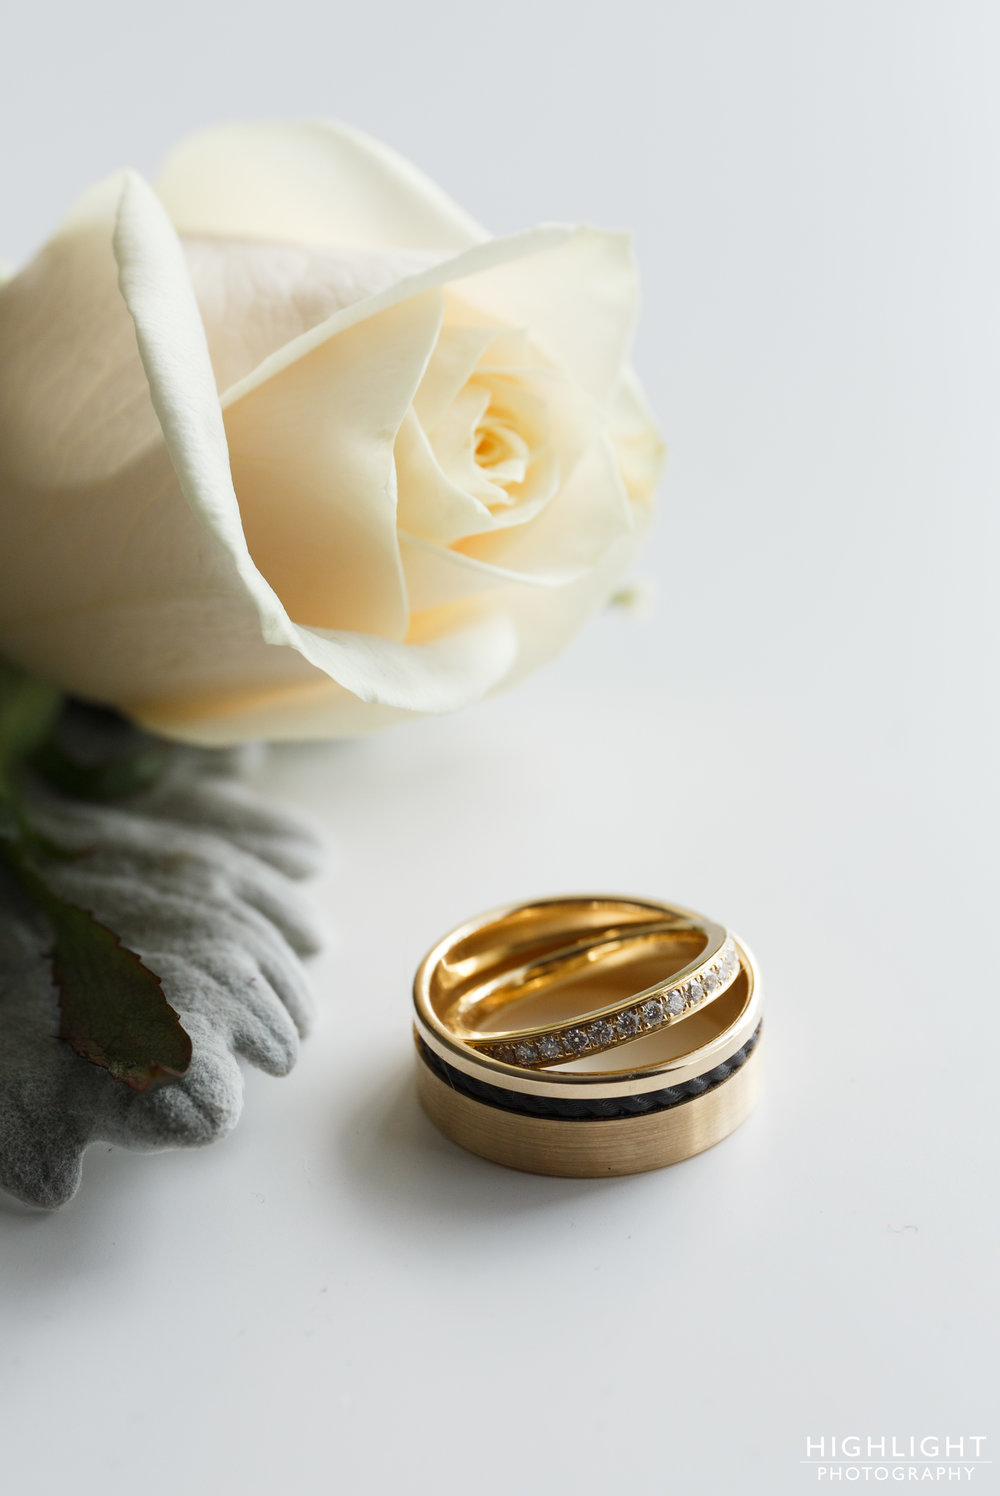 highlight-wedding-photography-palmerston-north-new-zealand-orlando-country-club-wedding-14.jpg